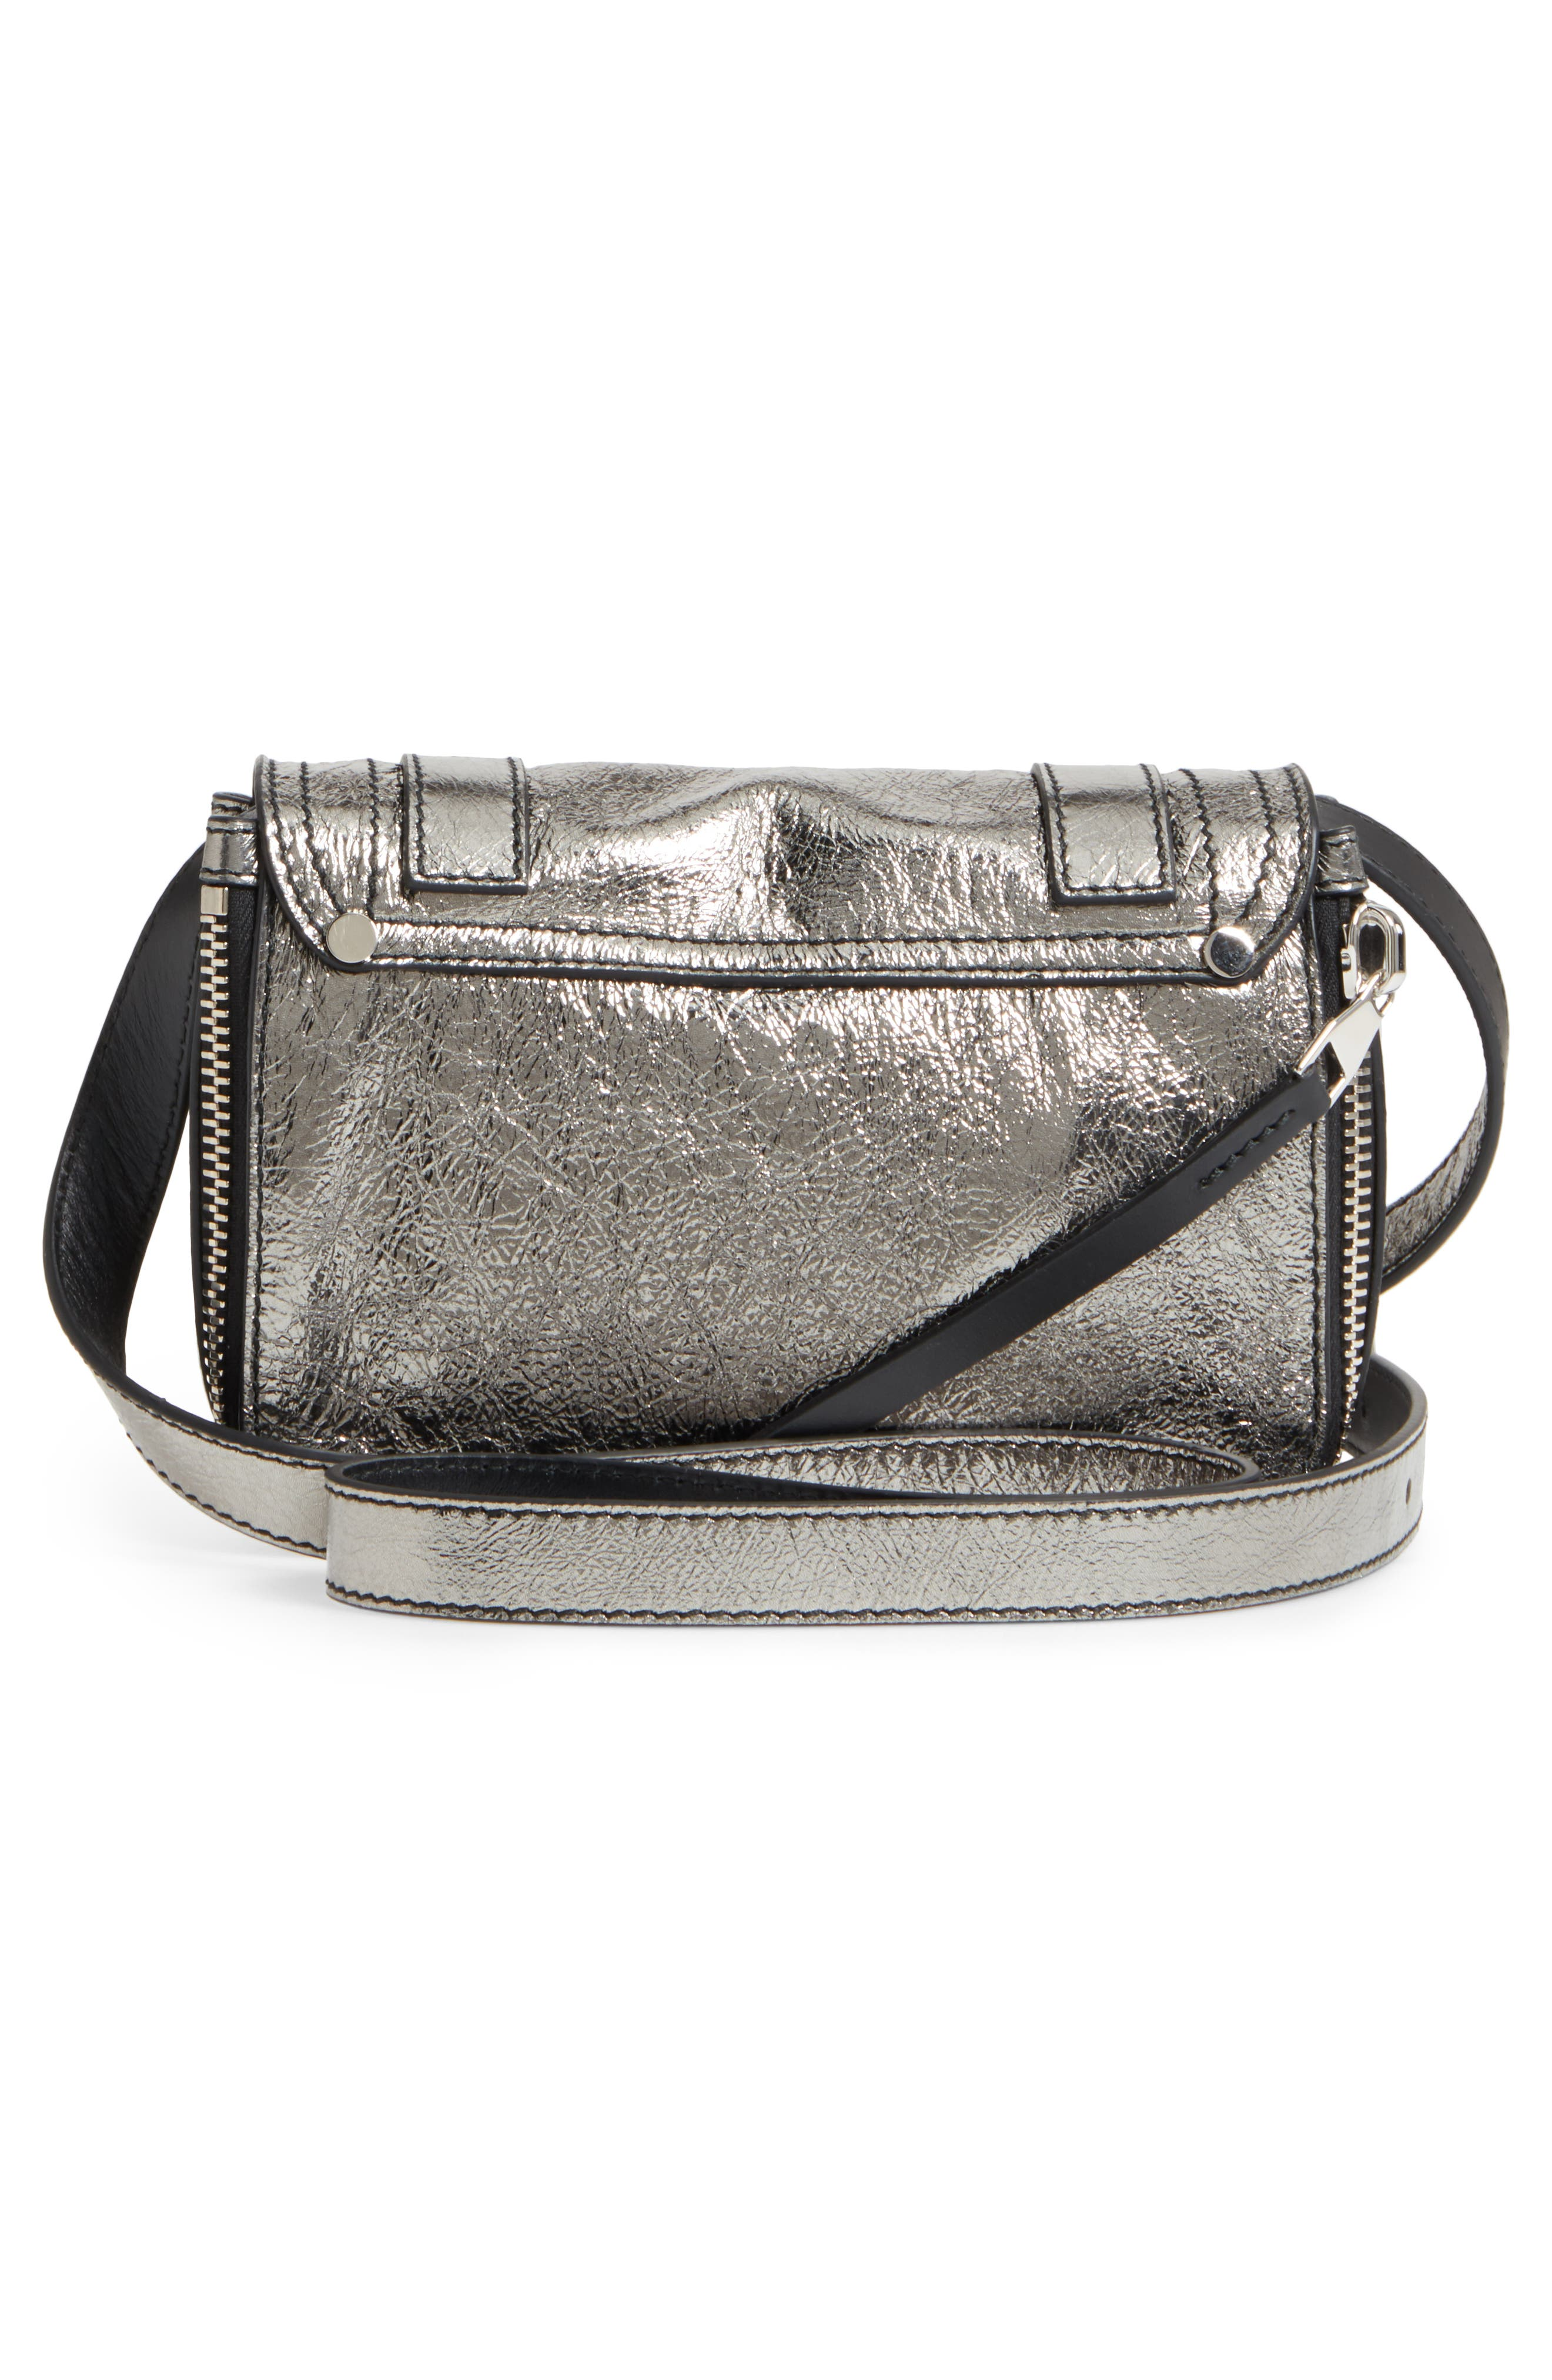 Mini PS1 Metallic Leather Crossbody Bag,                             Alternate thumbnail 3, color,                             Dark Silver